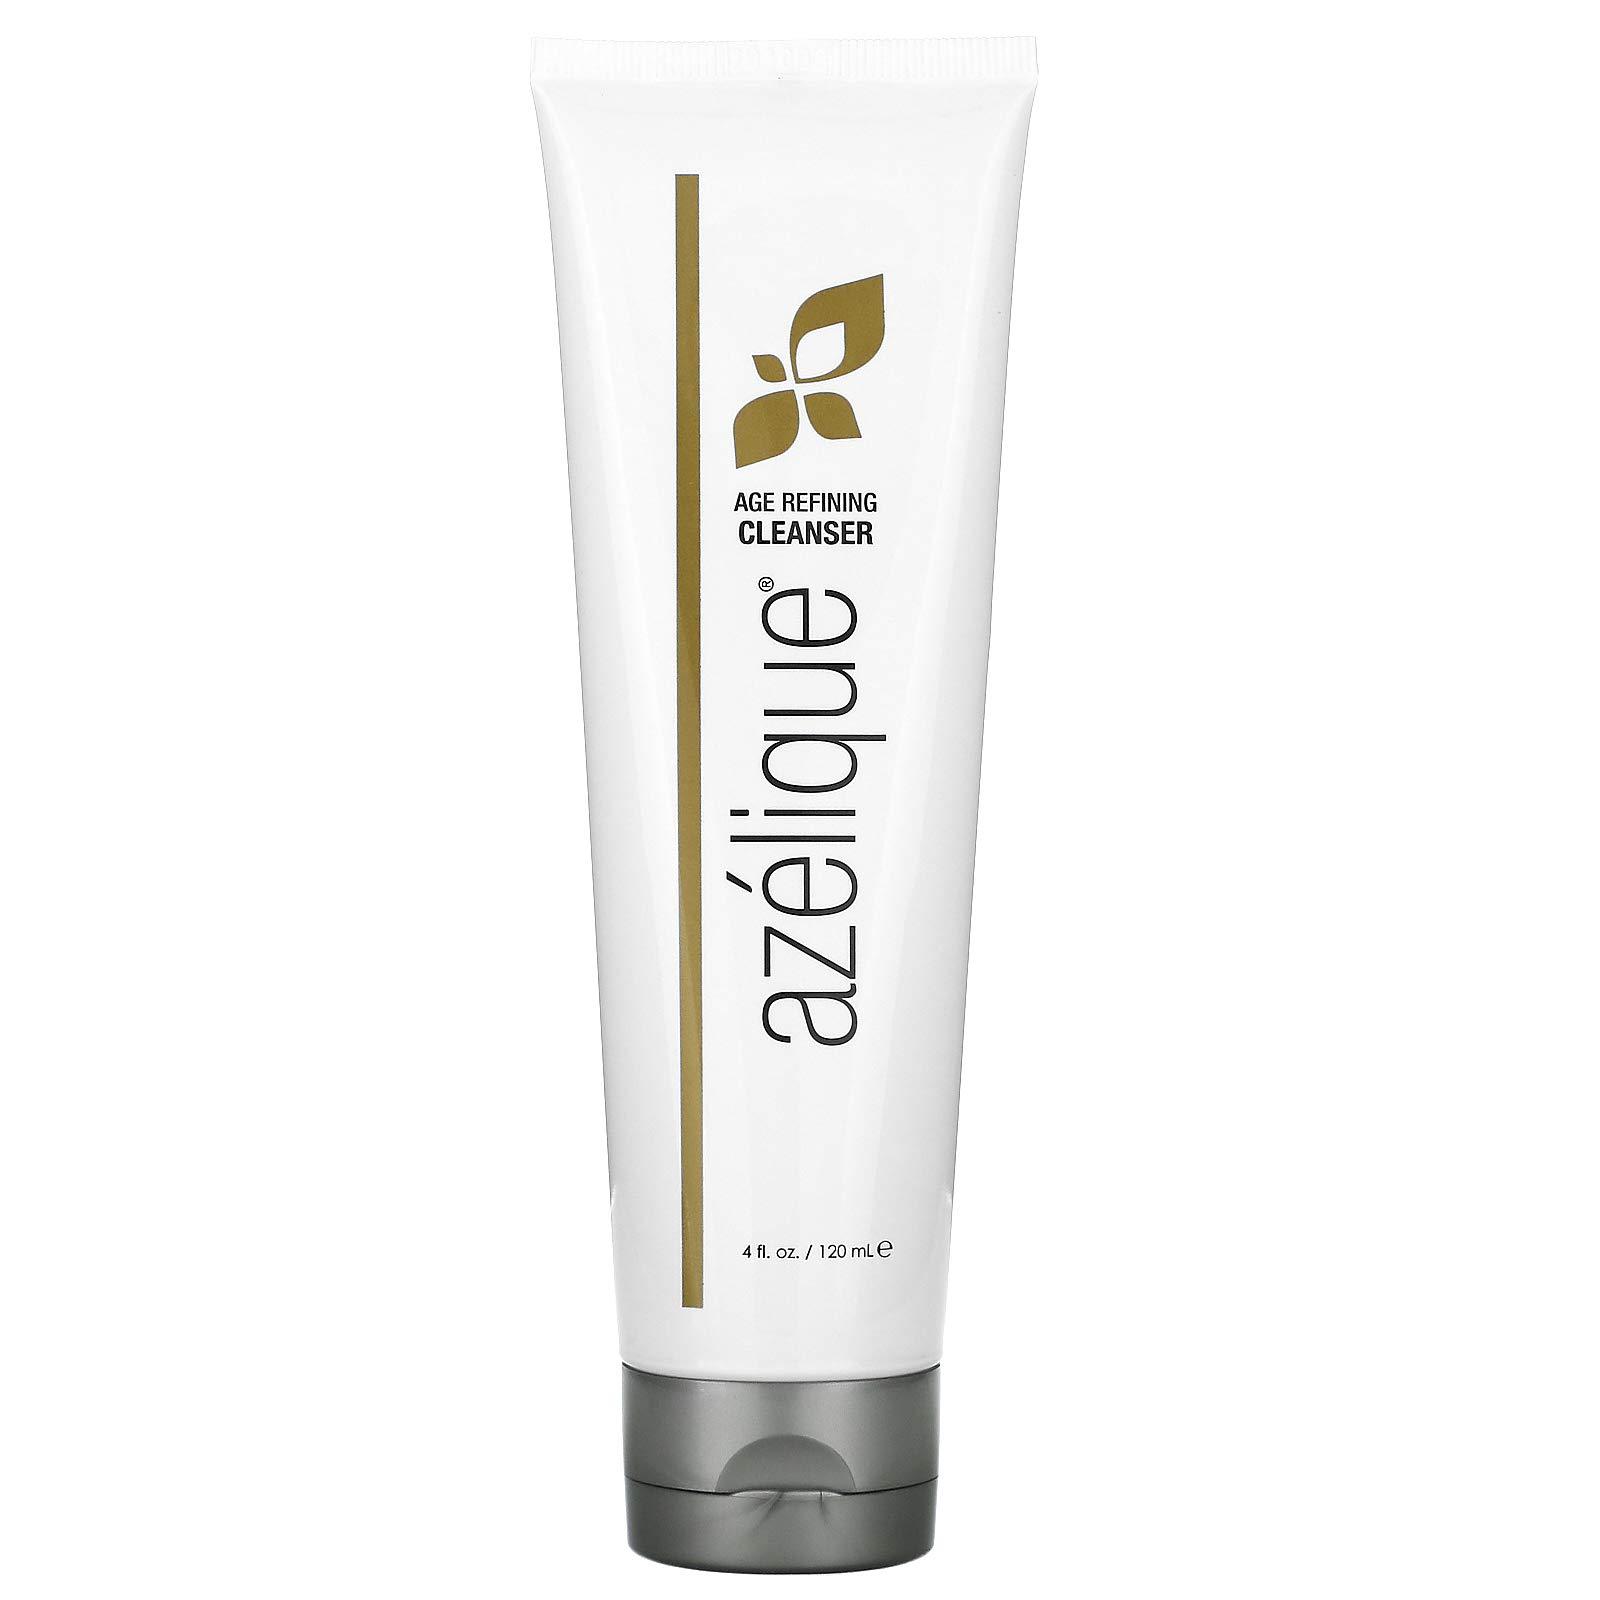 Azelique Age Refining Cleanser, Botanical Ingredients, Sulfate Free, No Parabens, 4 fl oz (120 ml)